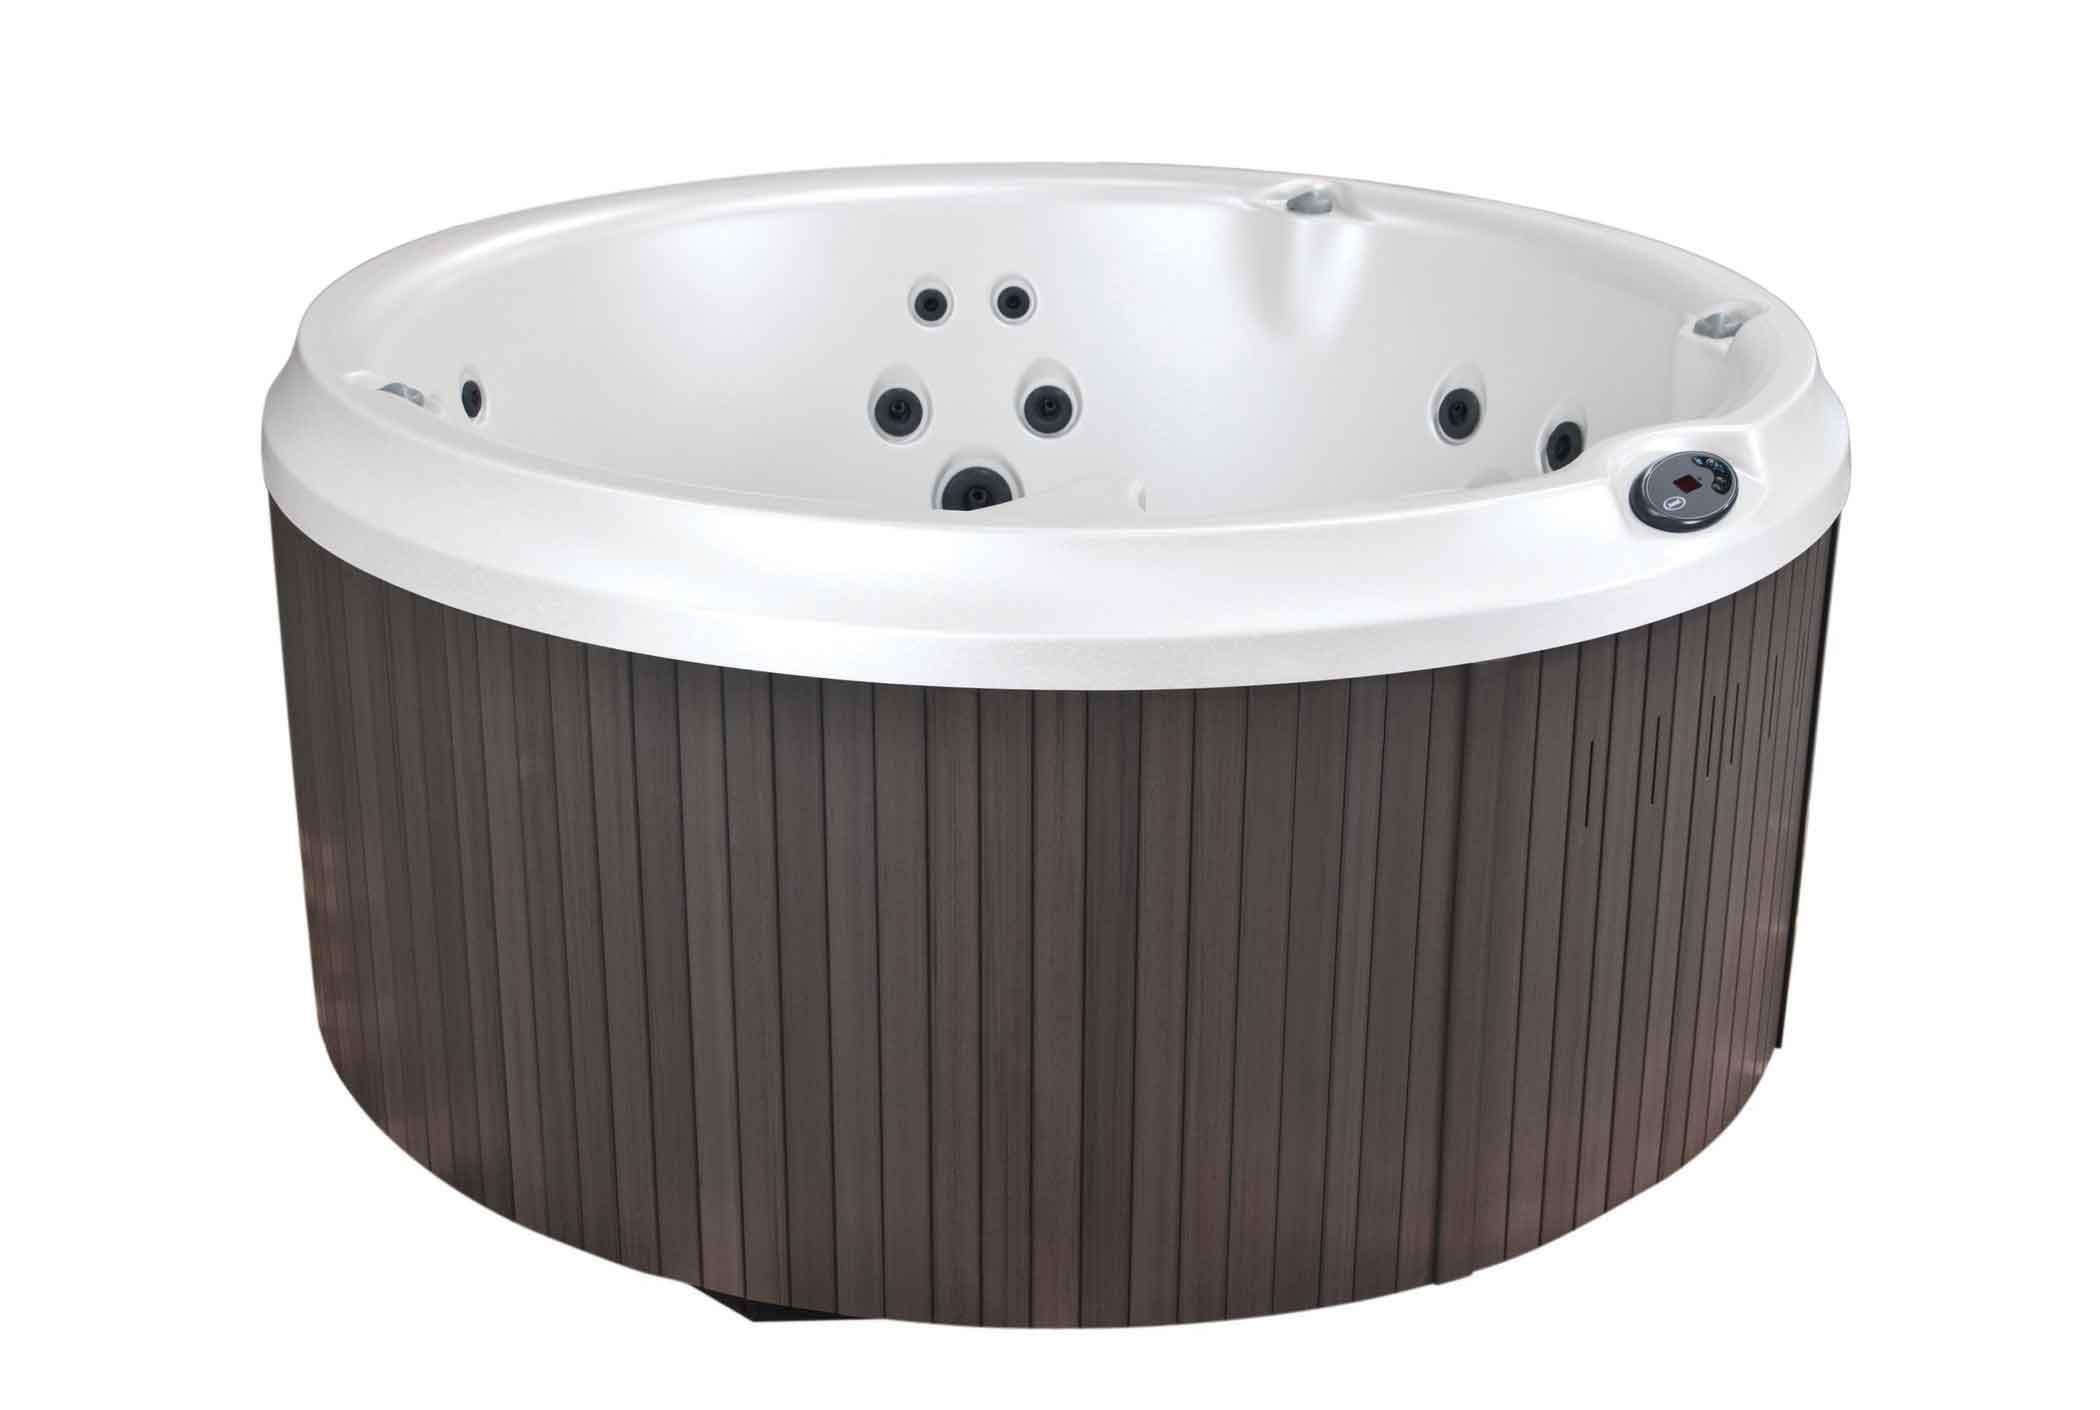 J-210™ hot tub in Hurricane, Utah